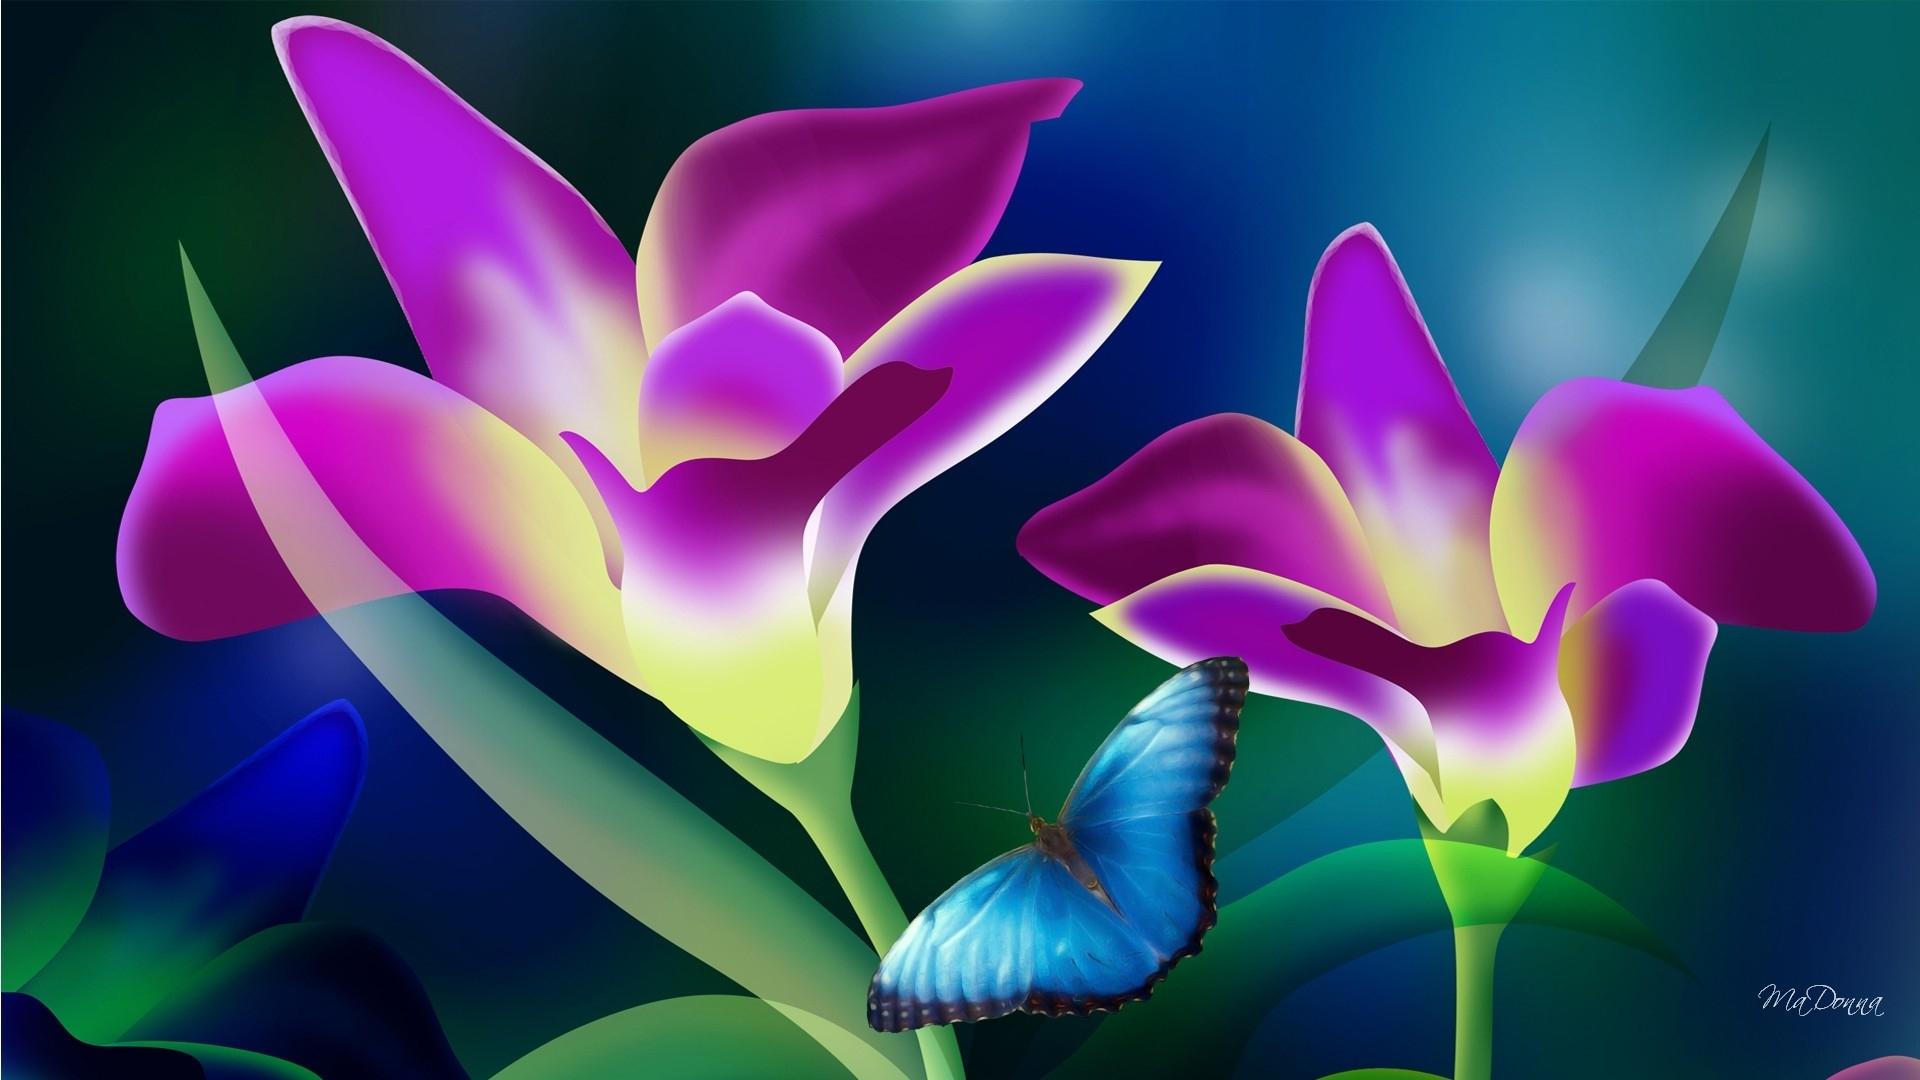 tropical flowers wallpaper | 1920x1080 | #42569 | flowers